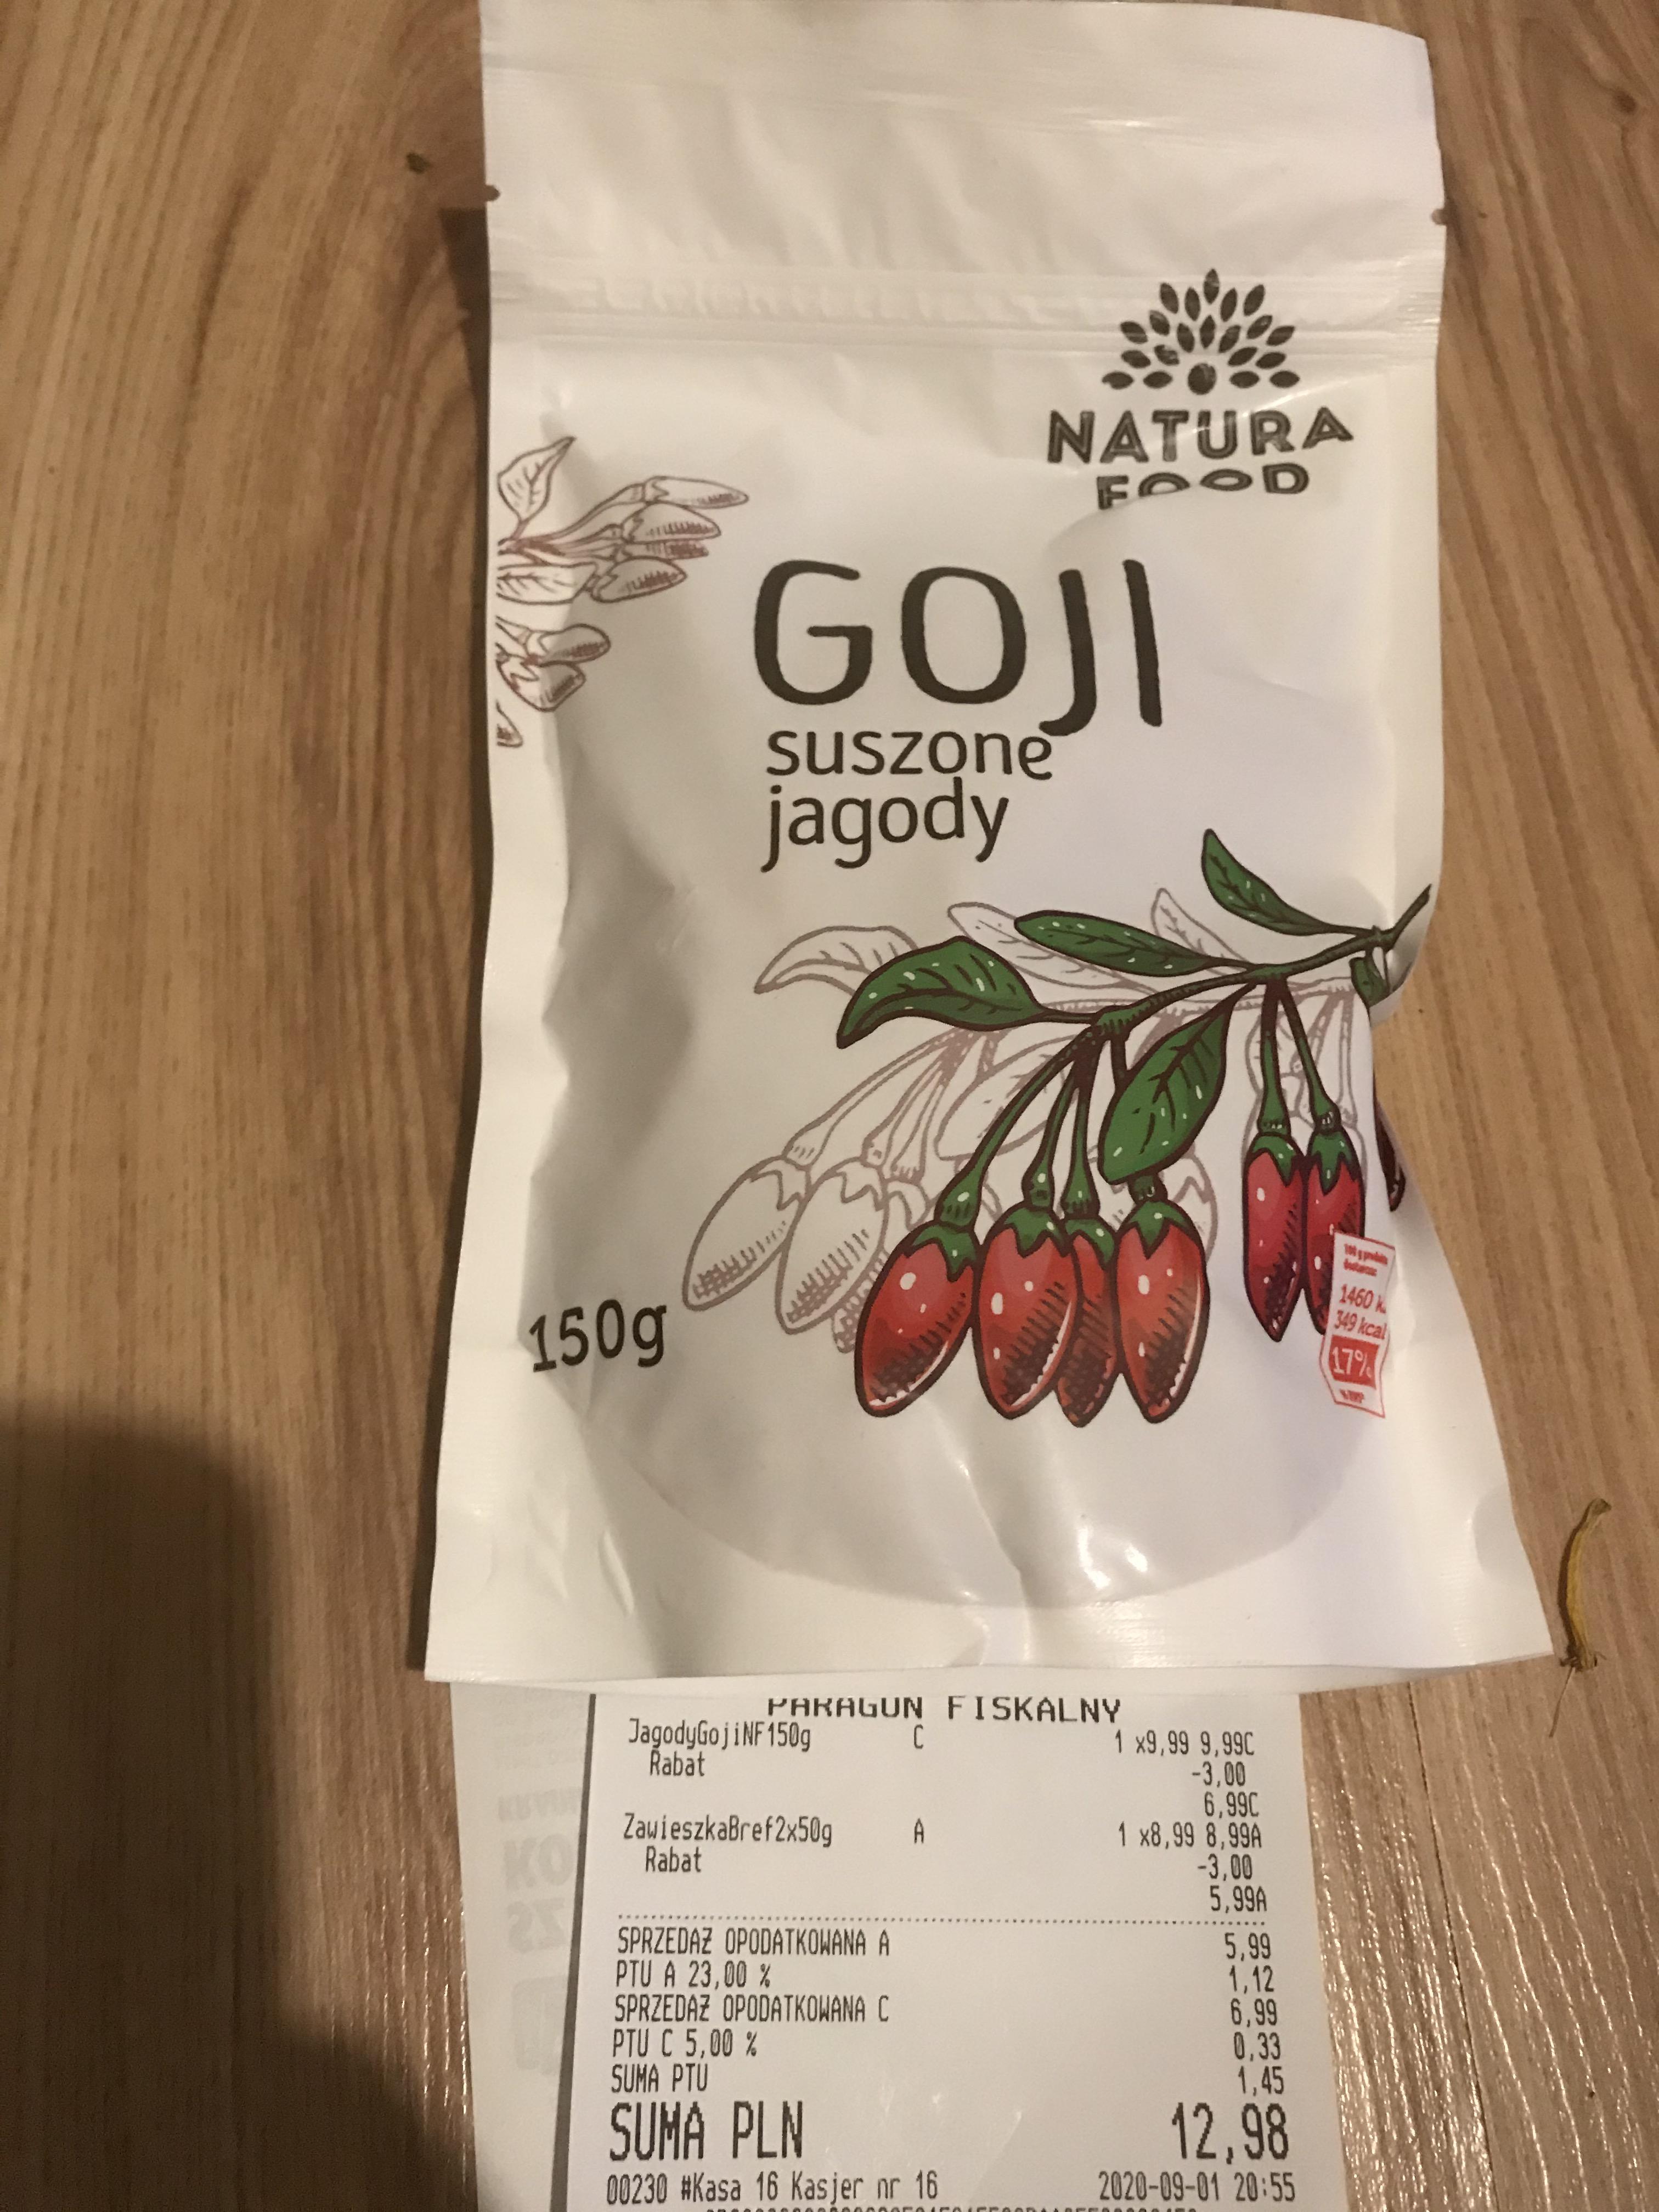 Suszone jagody goji - Biedronka